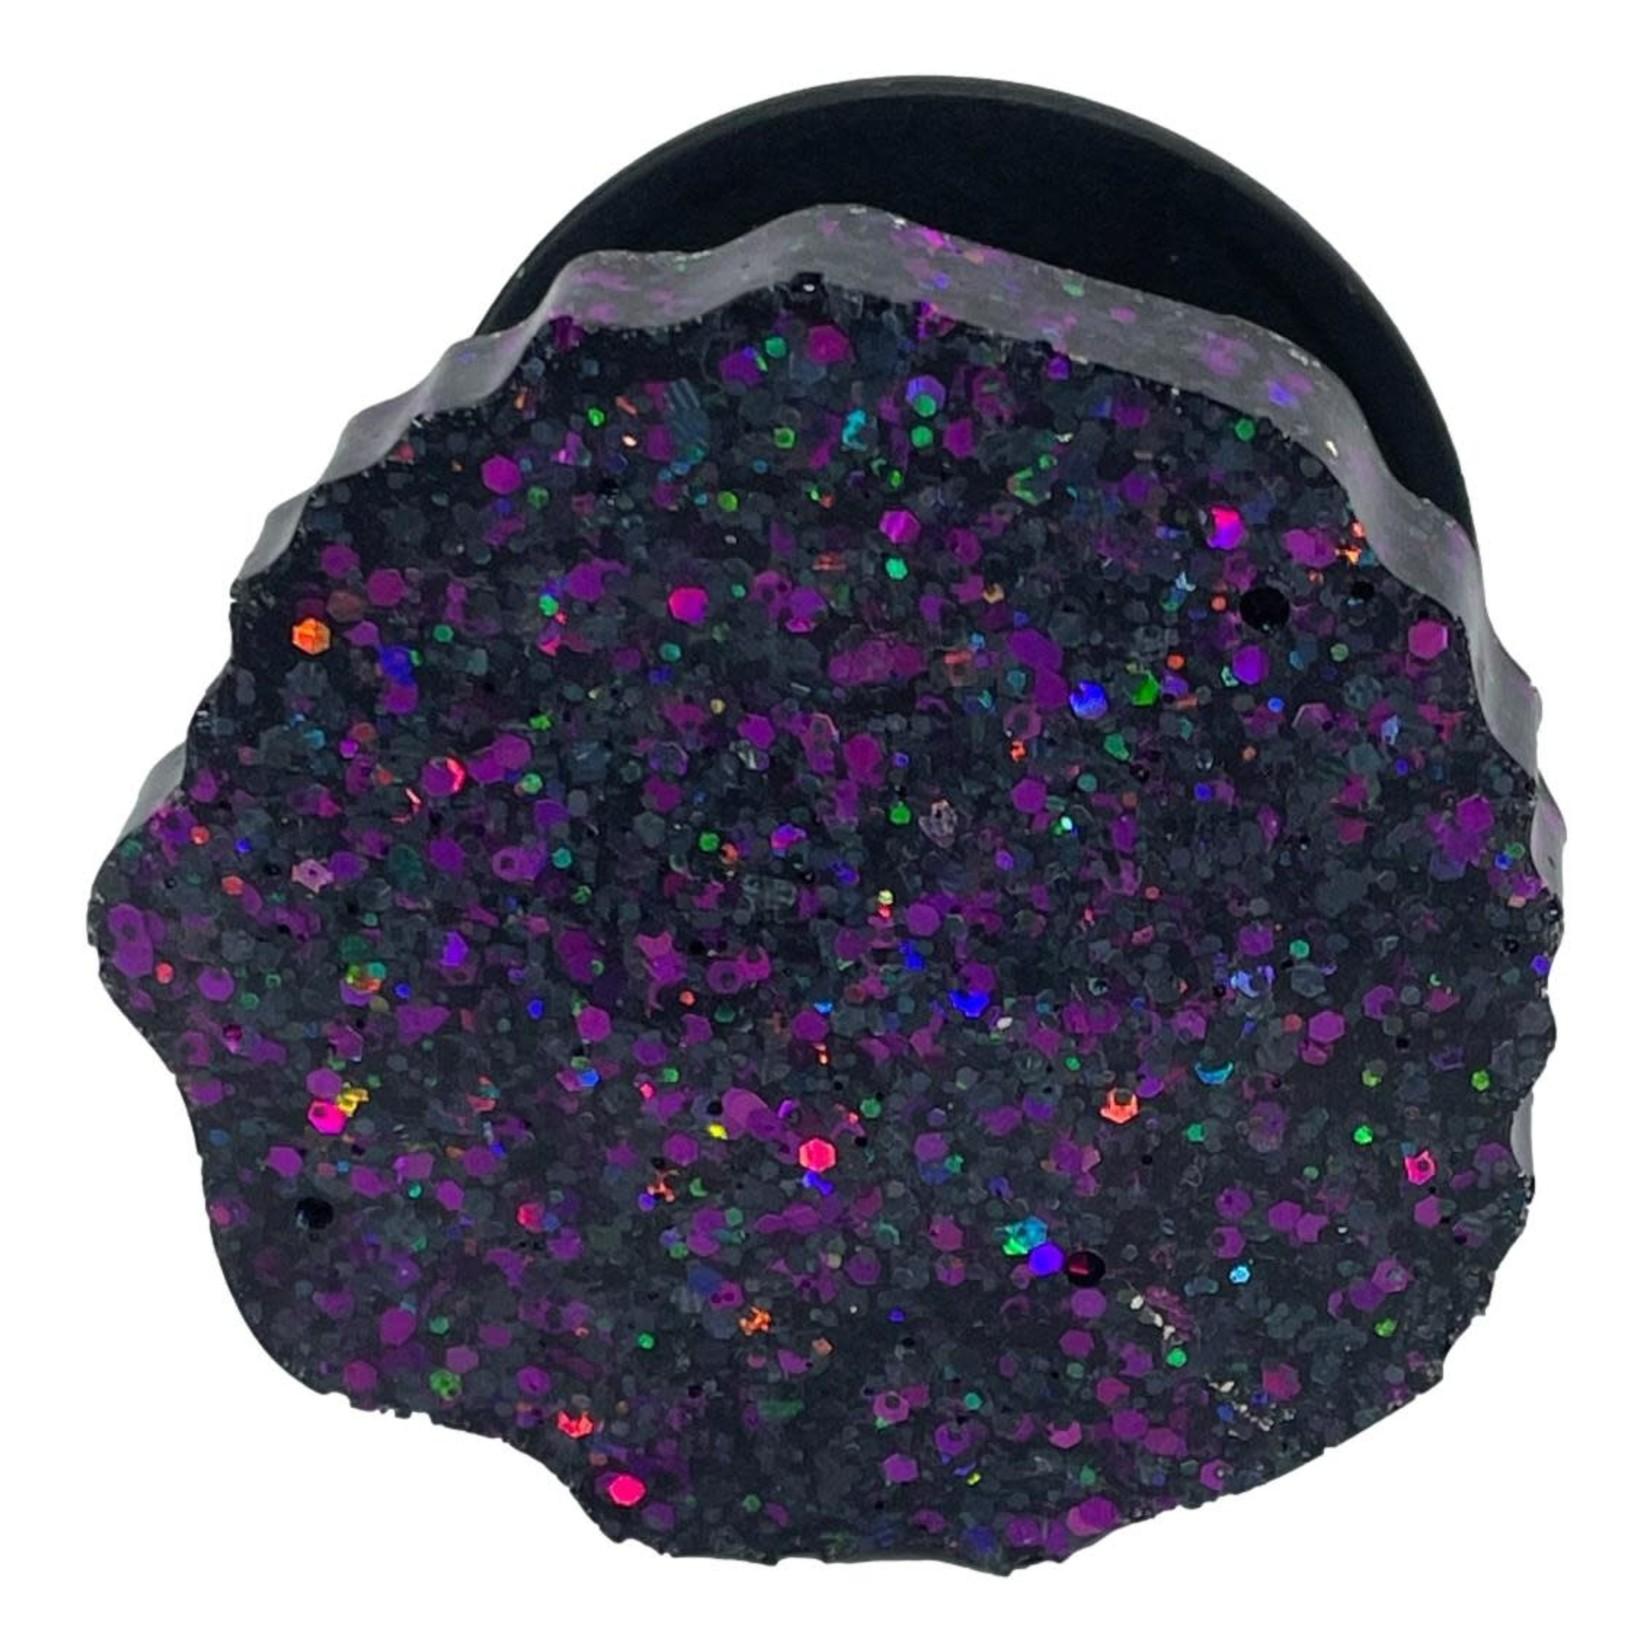 East Coast Sirens Black & Purple Glitter Geode Phone Grip